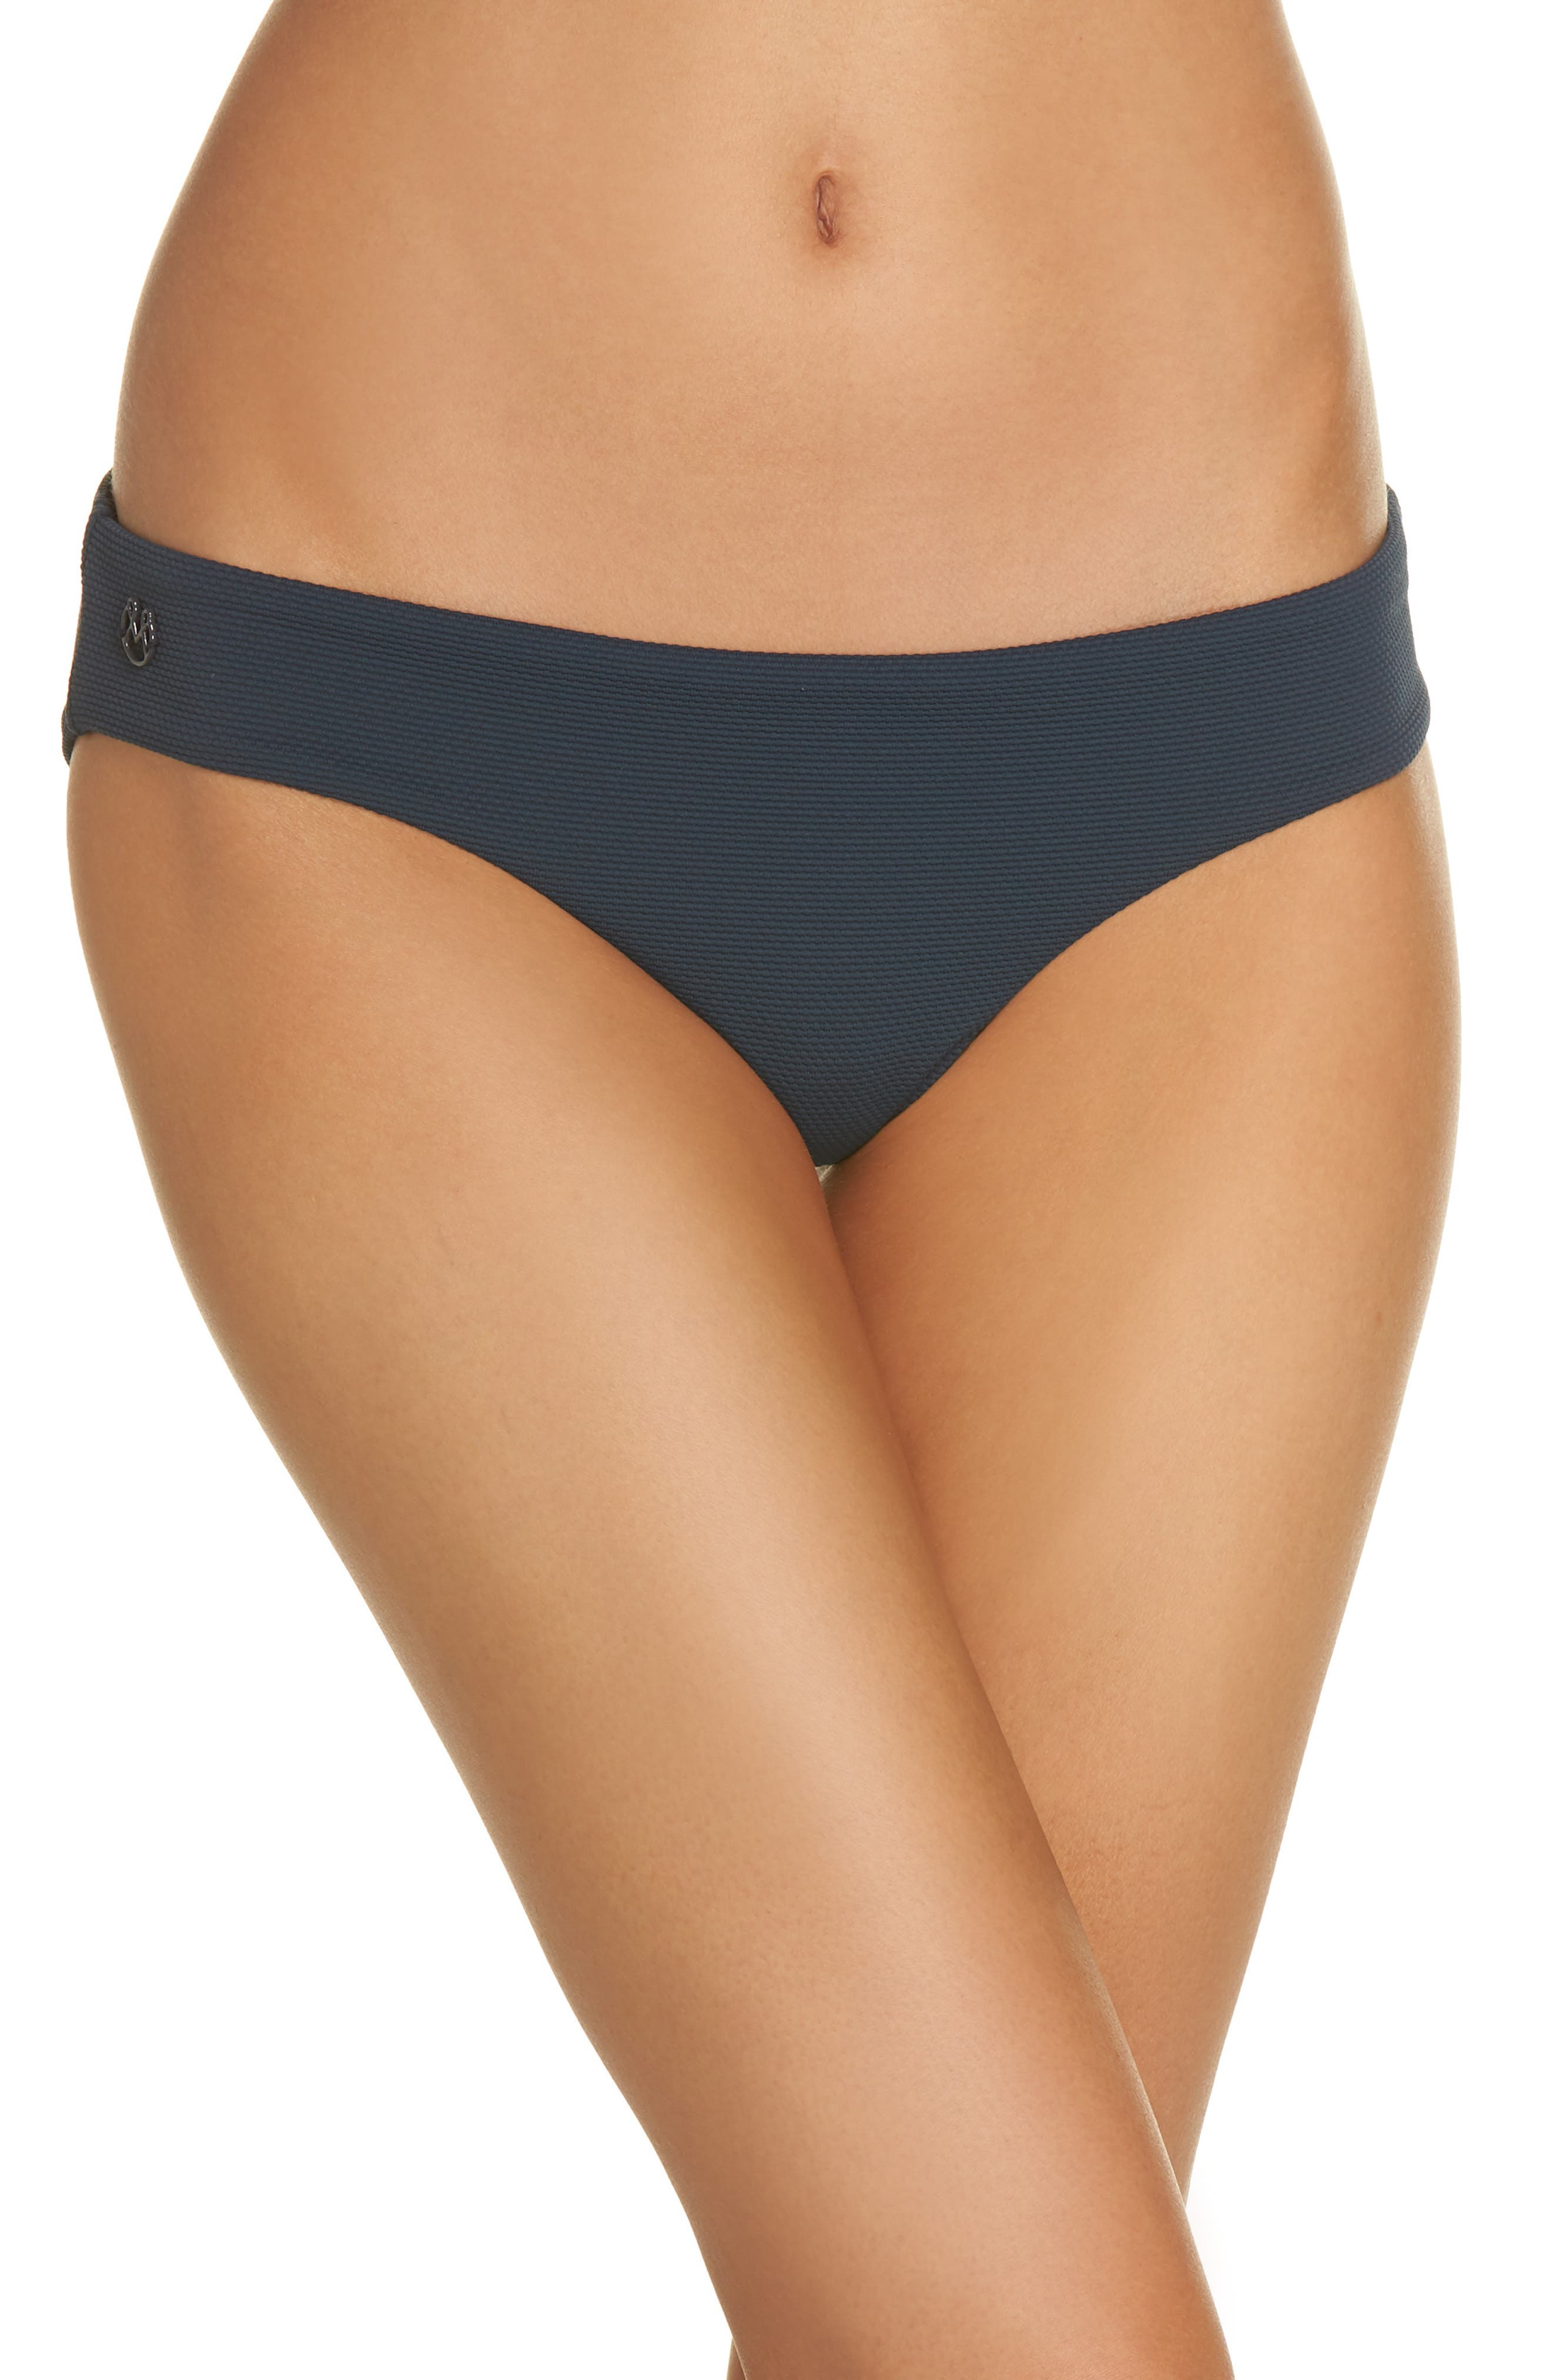 Stargazer Sublime Signature Reversible Bikini Bottoms,                         Main,                         color, 400